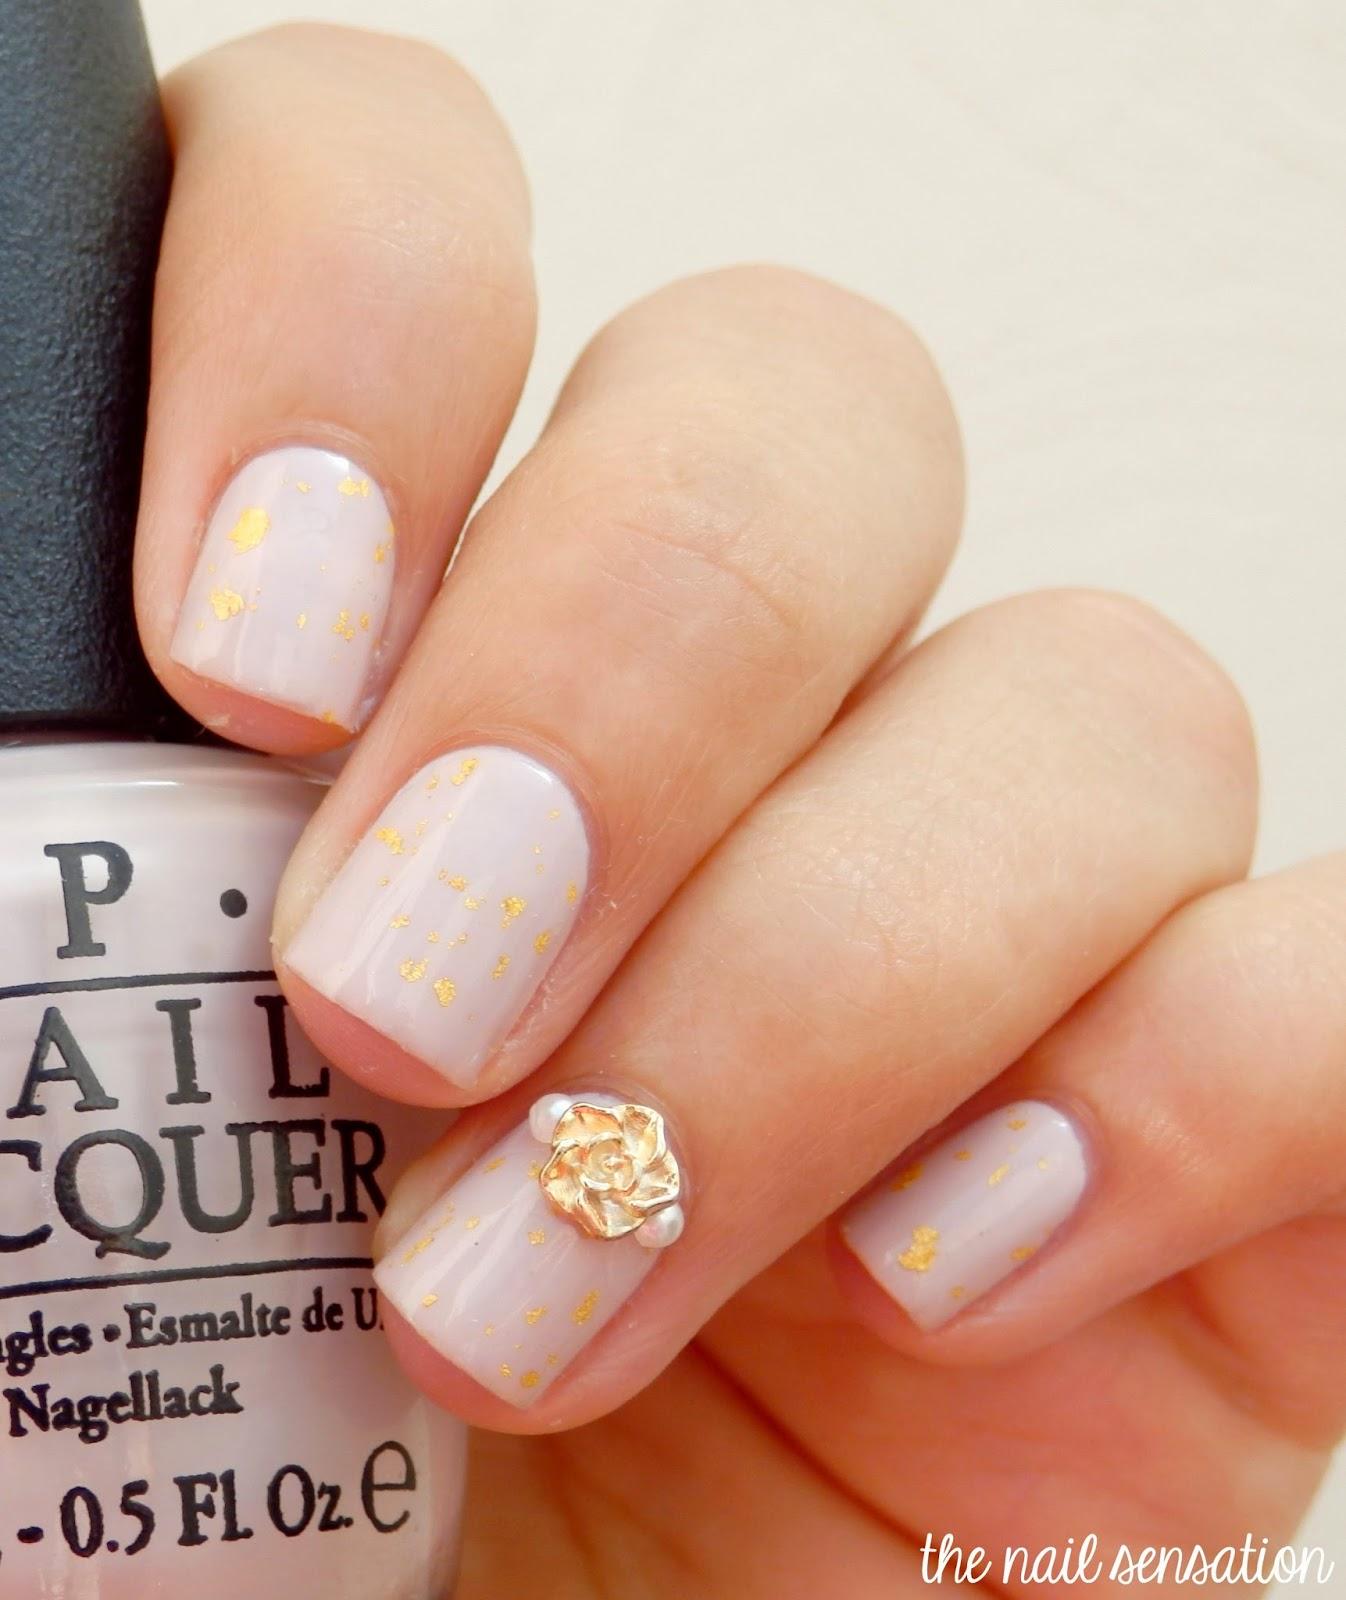 The nail sensation: julio 2014